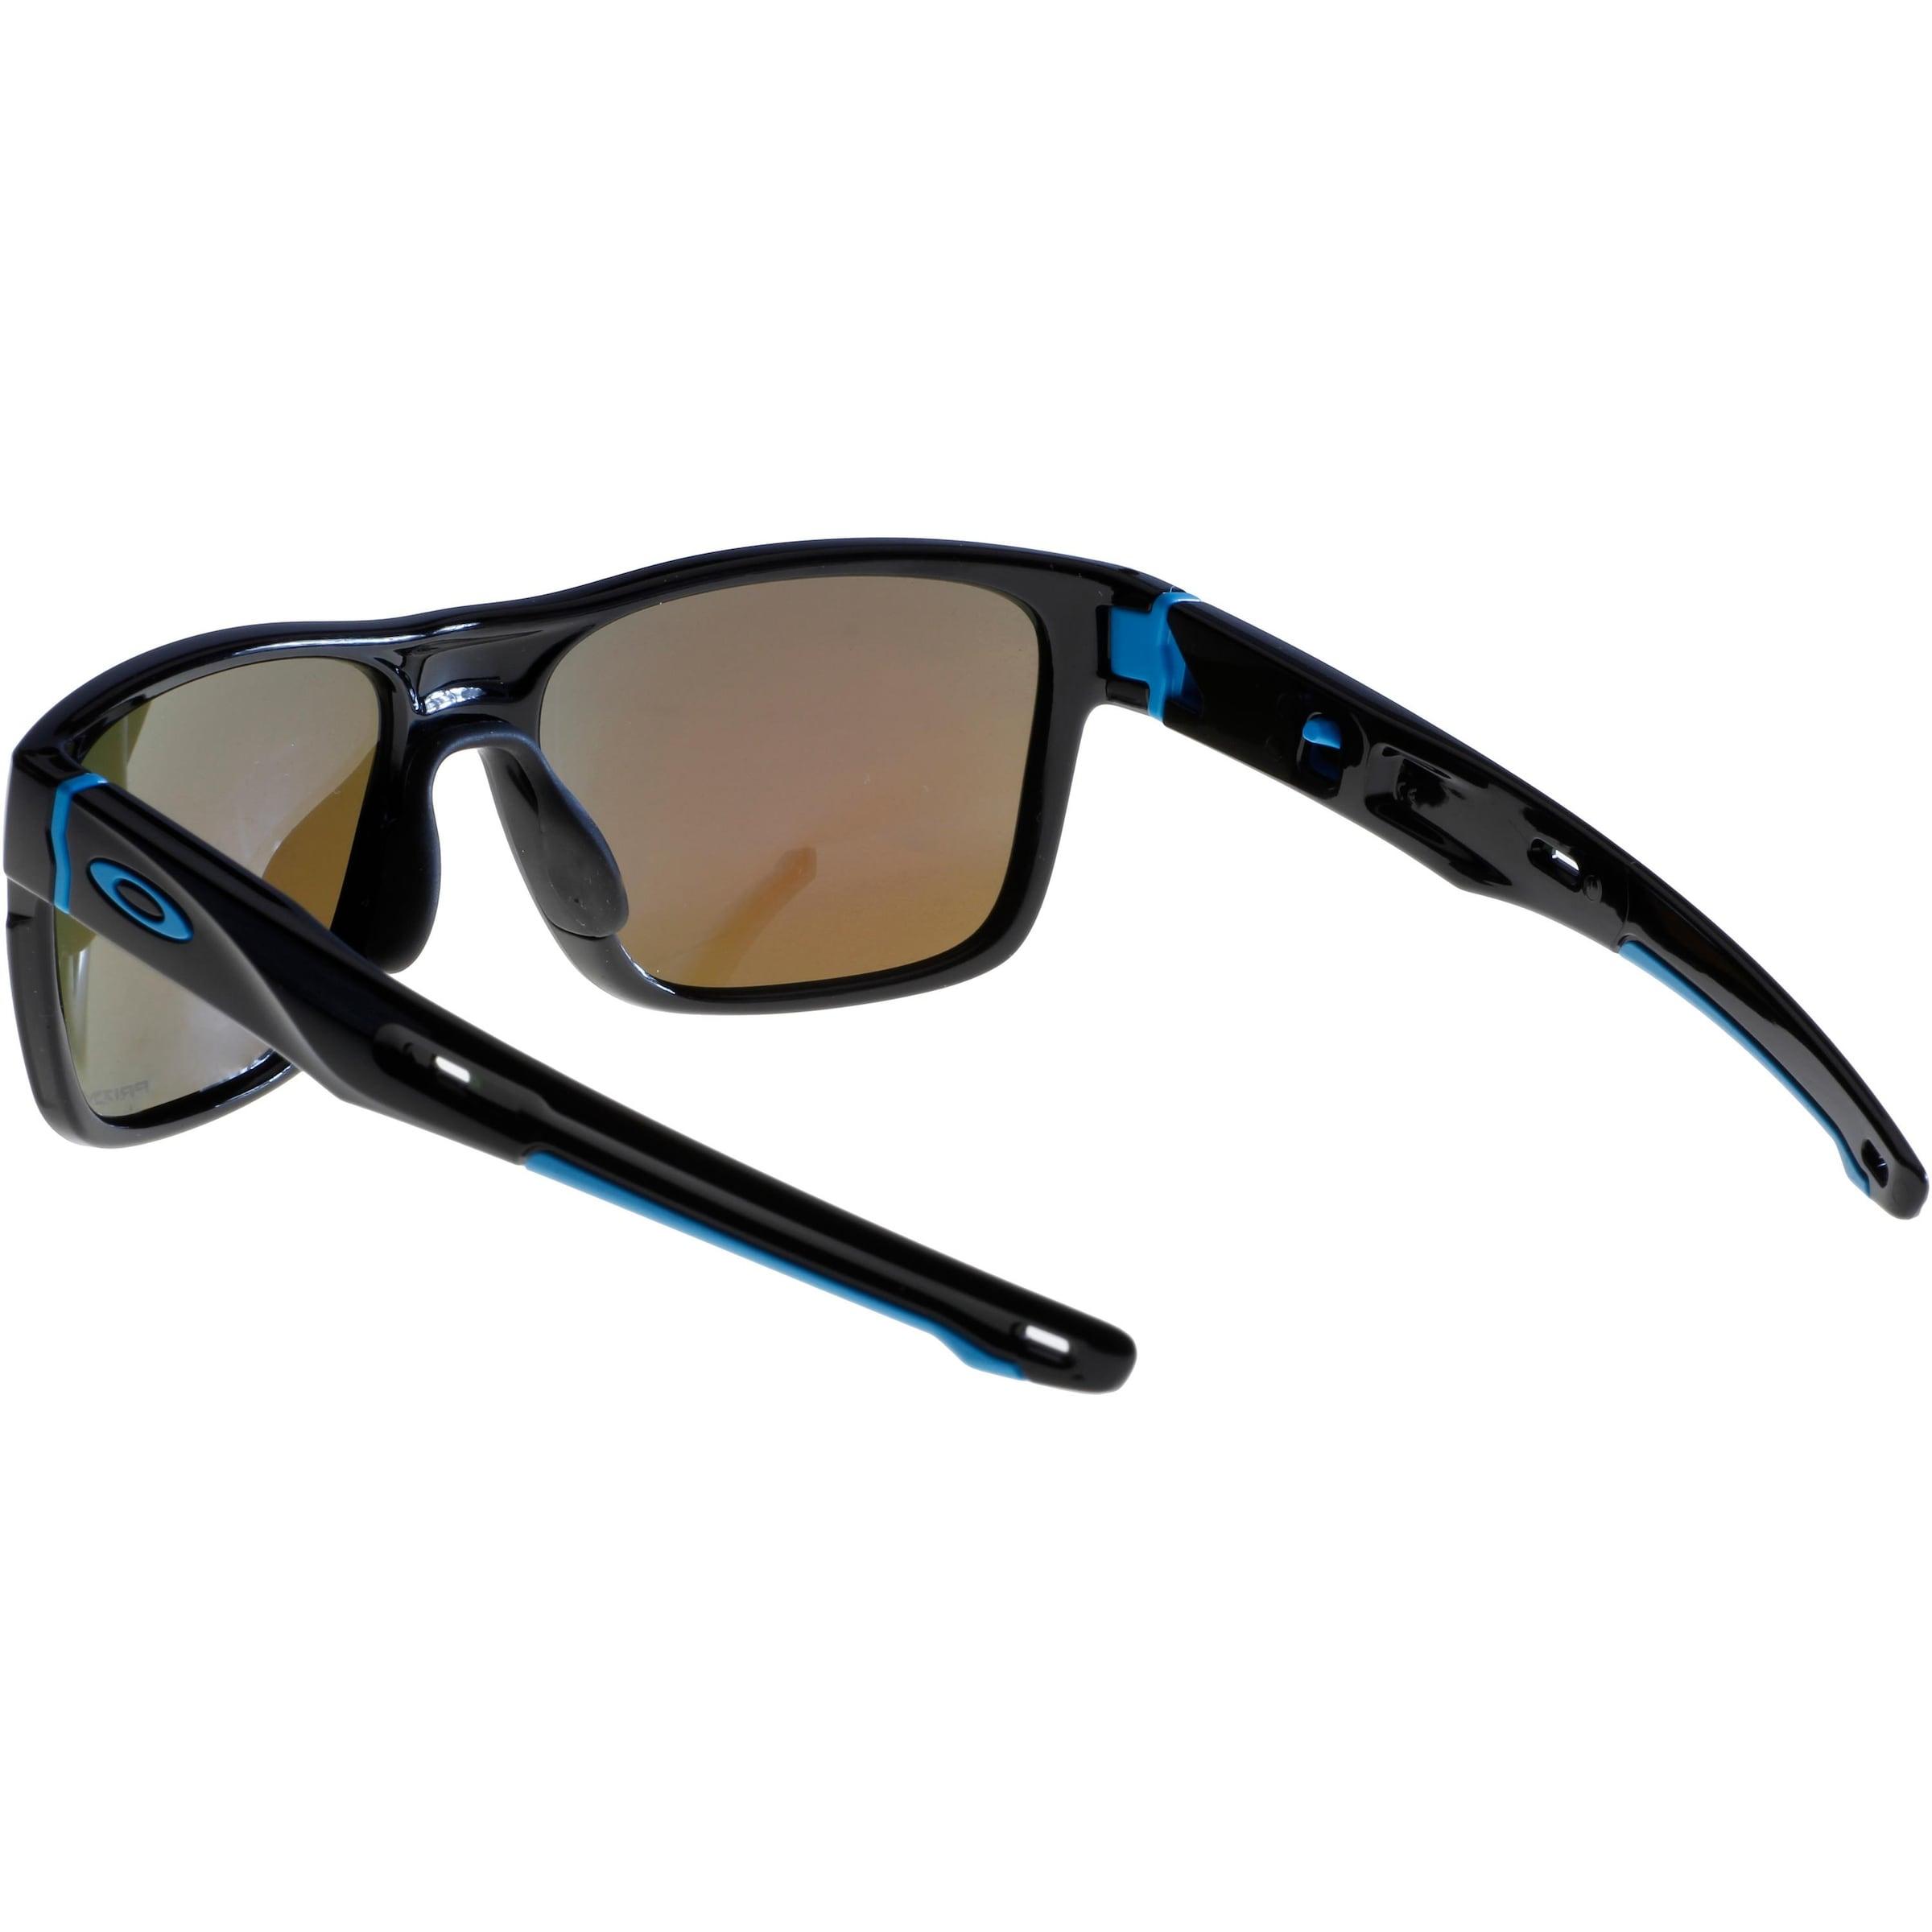 OAKLEY 'Corssrange' Sonnenbrille Auslass Visa Zahlung 7i6DYj8gOo